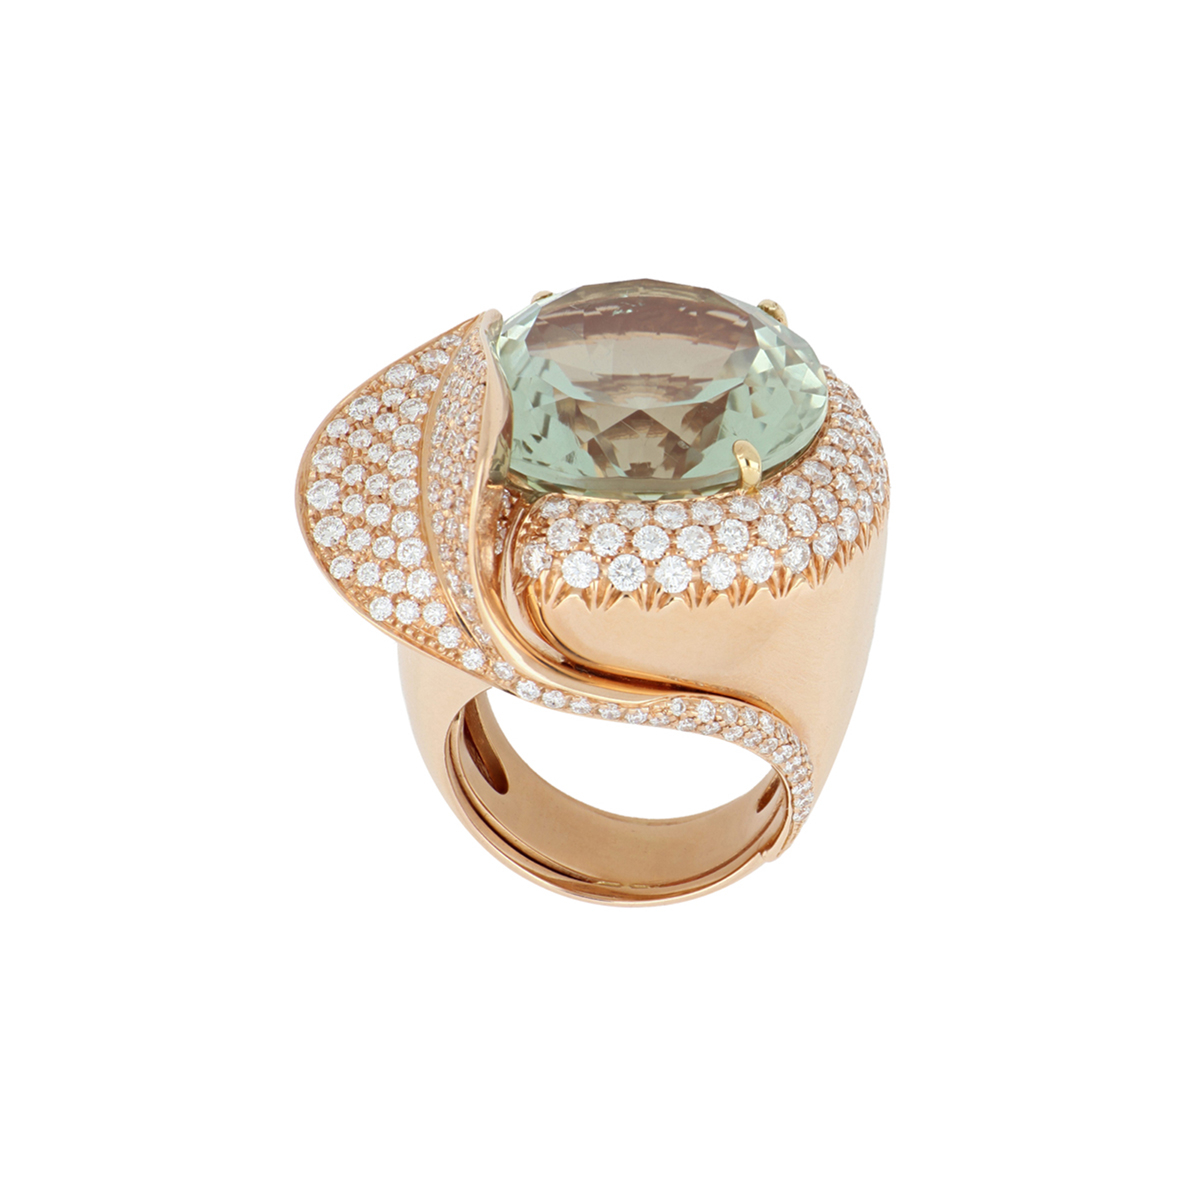 Round Amethyst Ring with Diamond Leaf